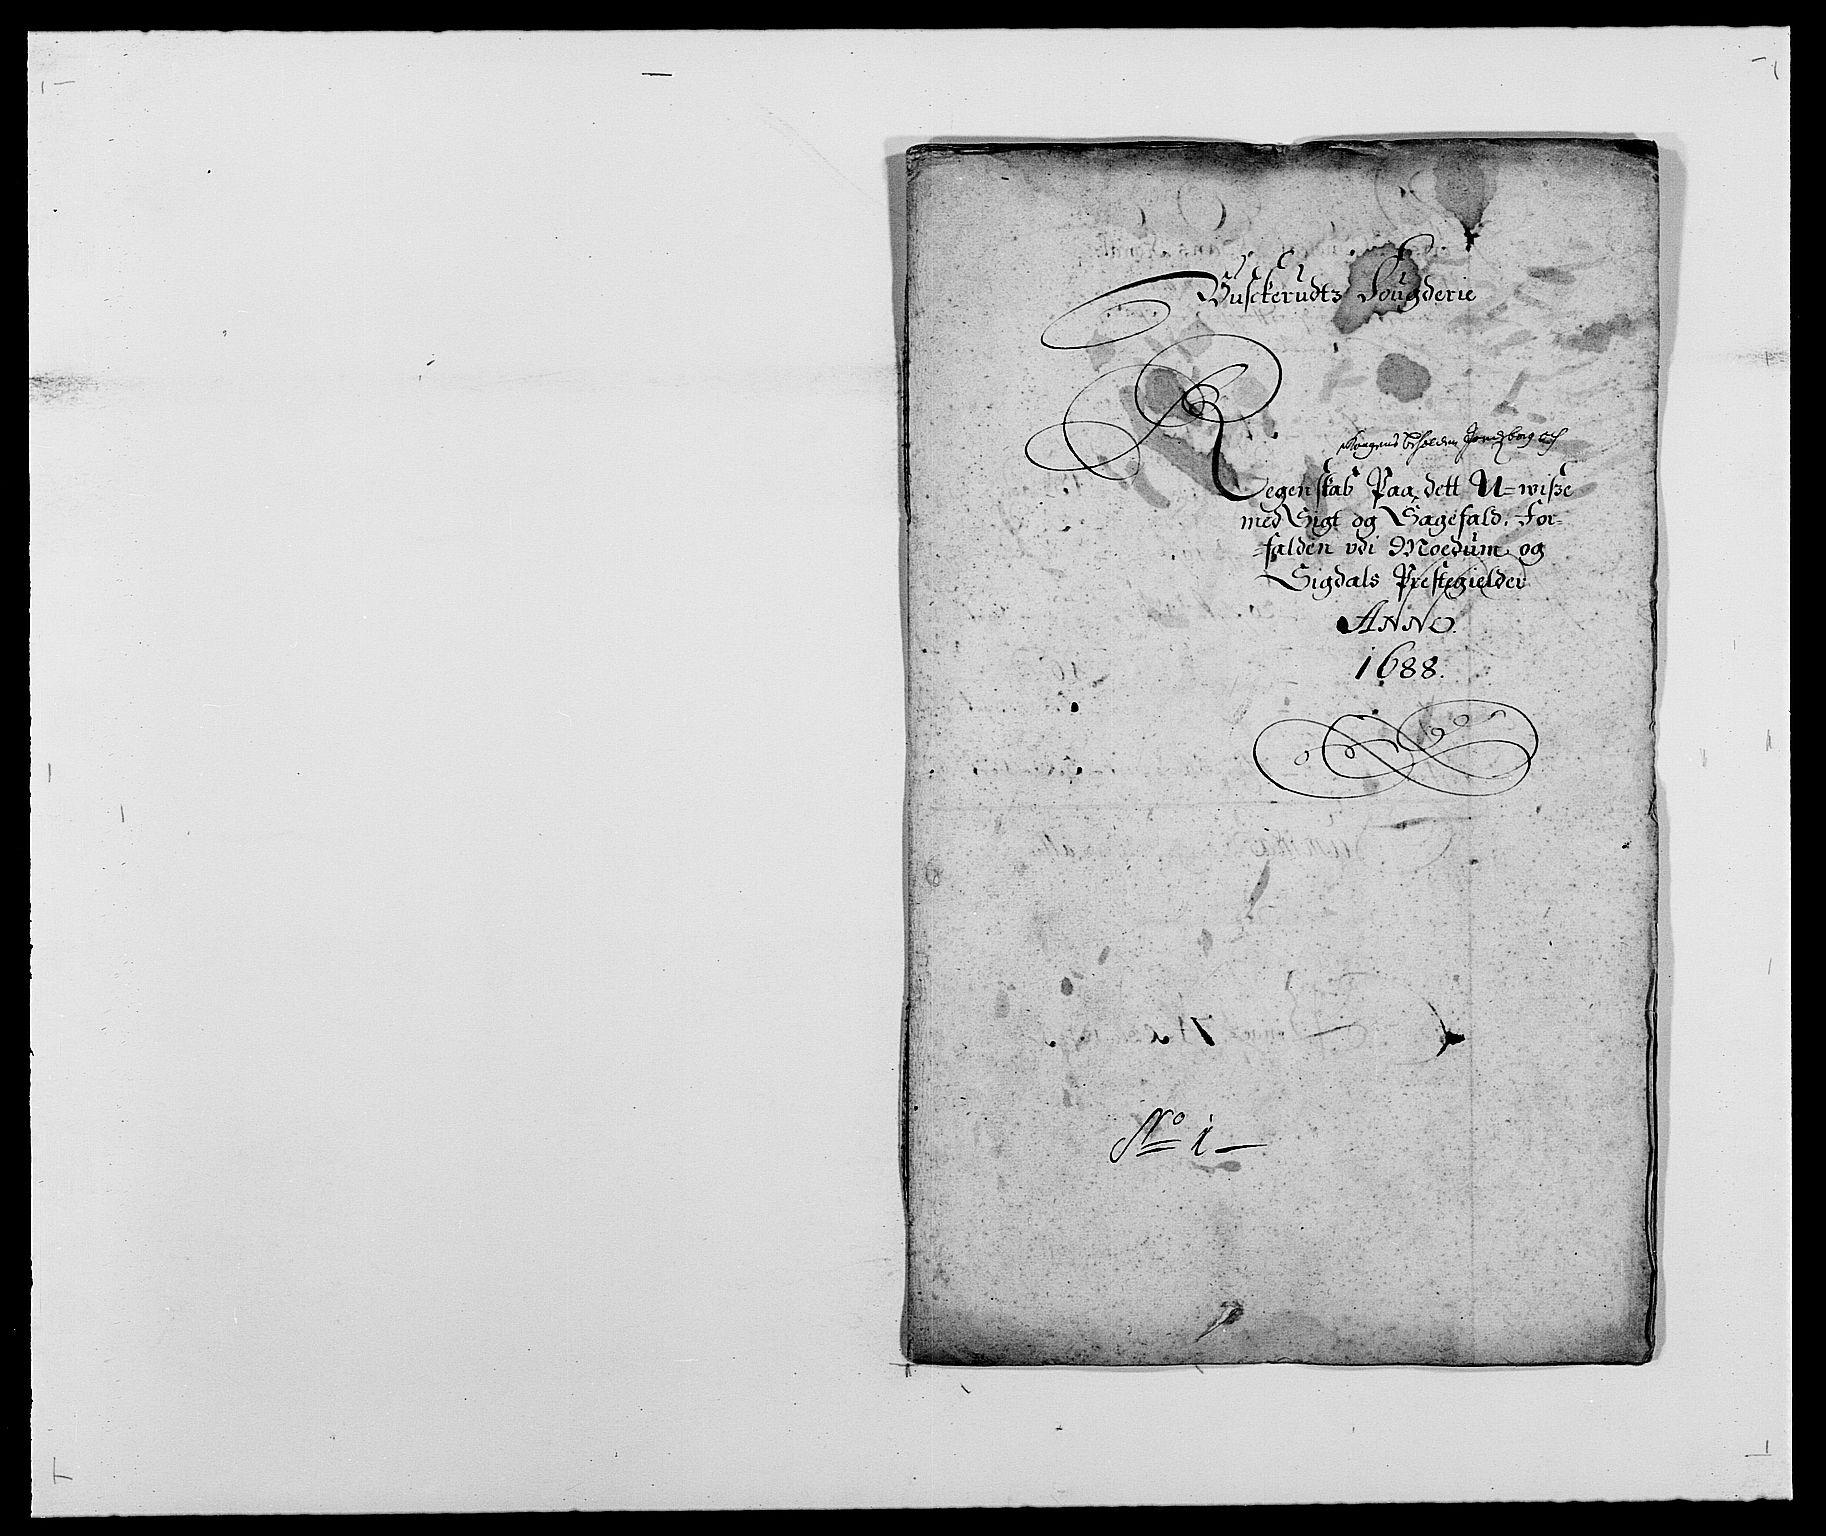 RA, Rentekammeret inntil 1814, Reviderte regnskaper, Fogderegnskap, R25/L1679: Fogderegnskap Buskerud, 1687-1688, s. 256